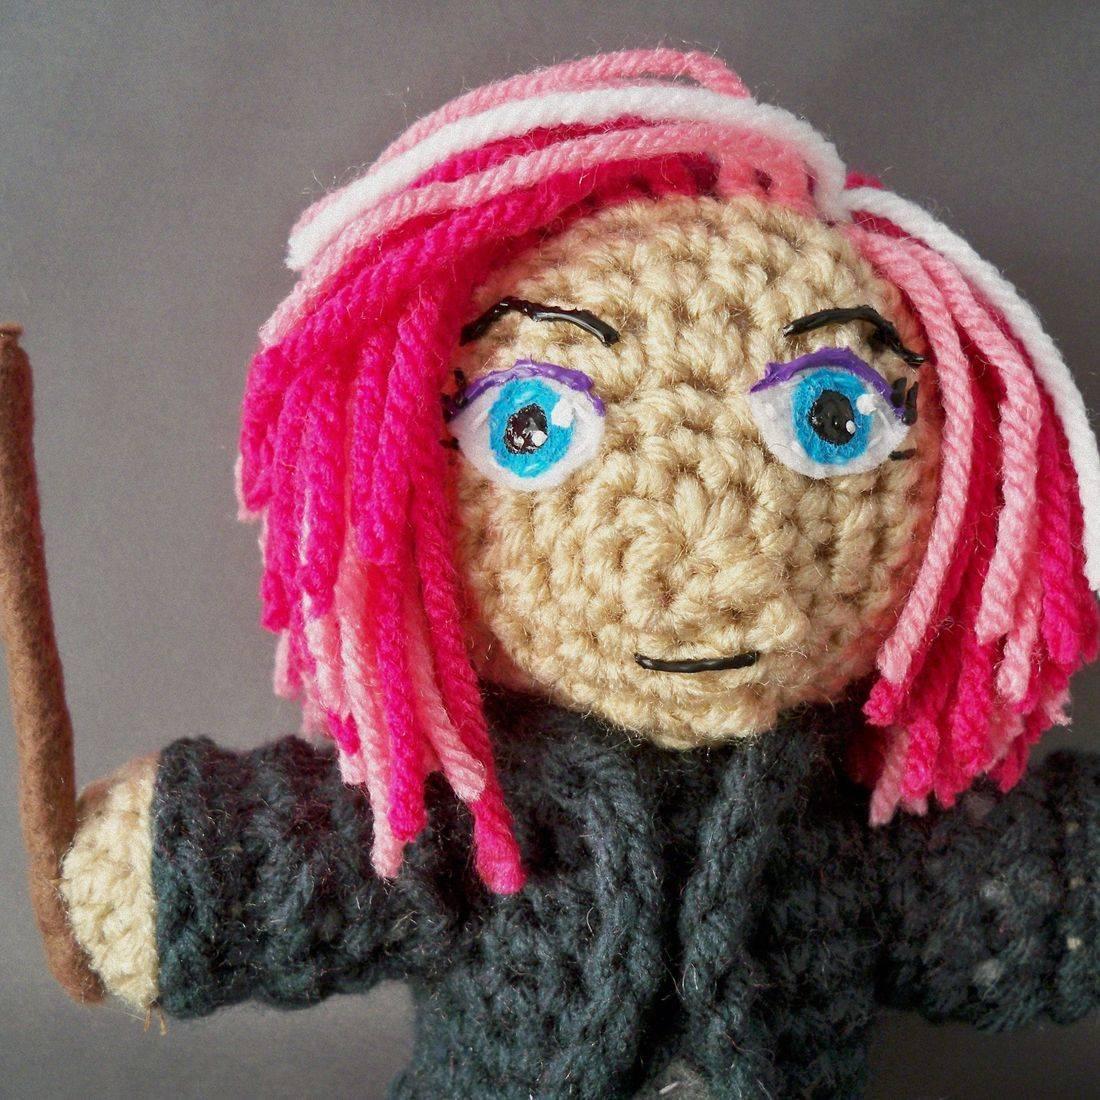 Nymphadora Tonks, Tonks, Harry Potter, Witch, Wizard, Magic, amigurumi, plush, doll, toy, handmade, crochet, nerd, geek